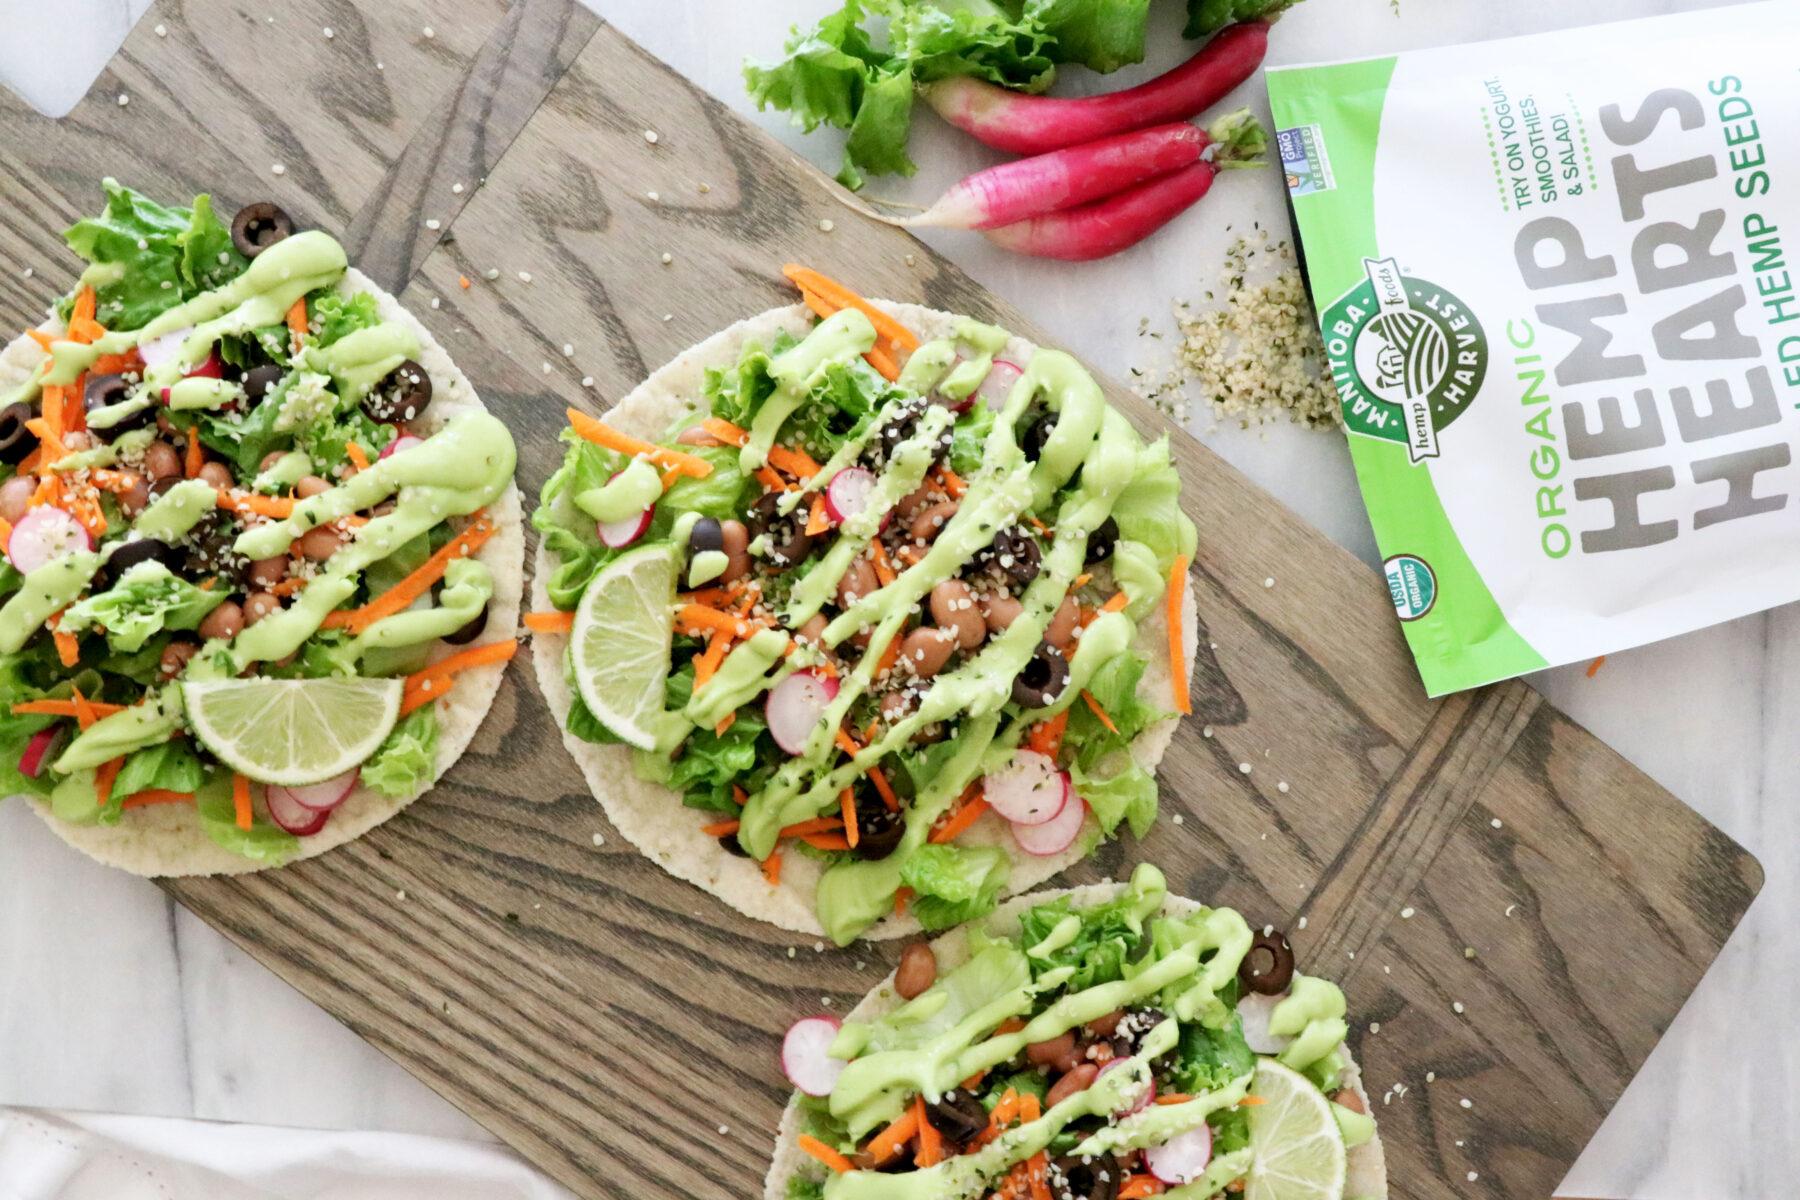 Three salad tacos on top of cutting board. Hemp hearts in top right corner.